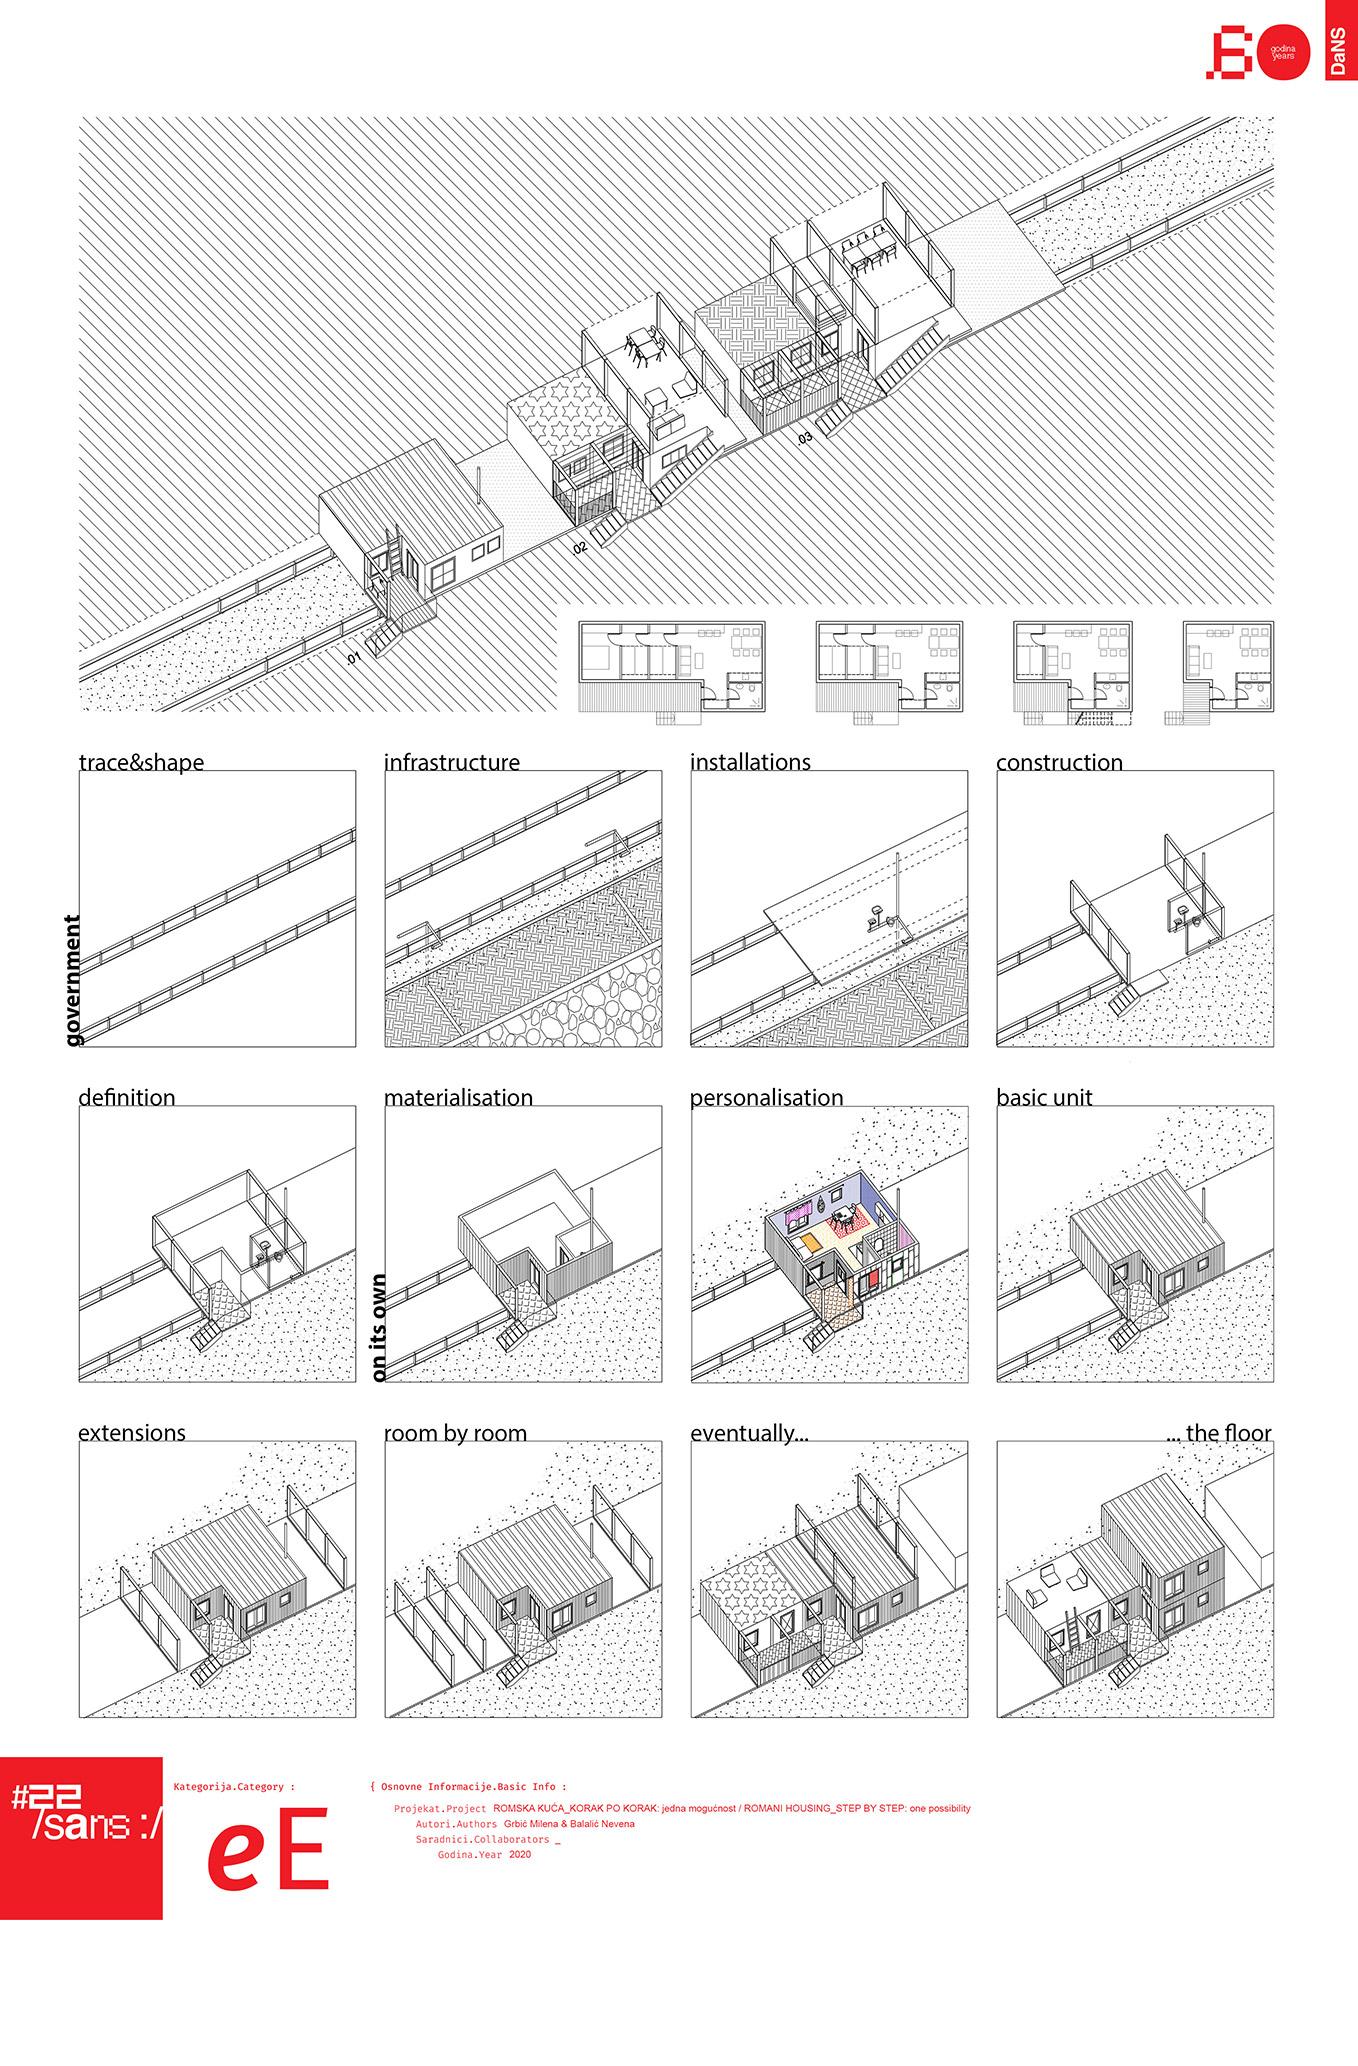 "<p class=""naslov-br"">ee02</p>ROMSKA KUĆA _ KORAK PO KORAK: jedna mogućnost // ROMA HOUSE _ STEP BY STEP: One possibility"